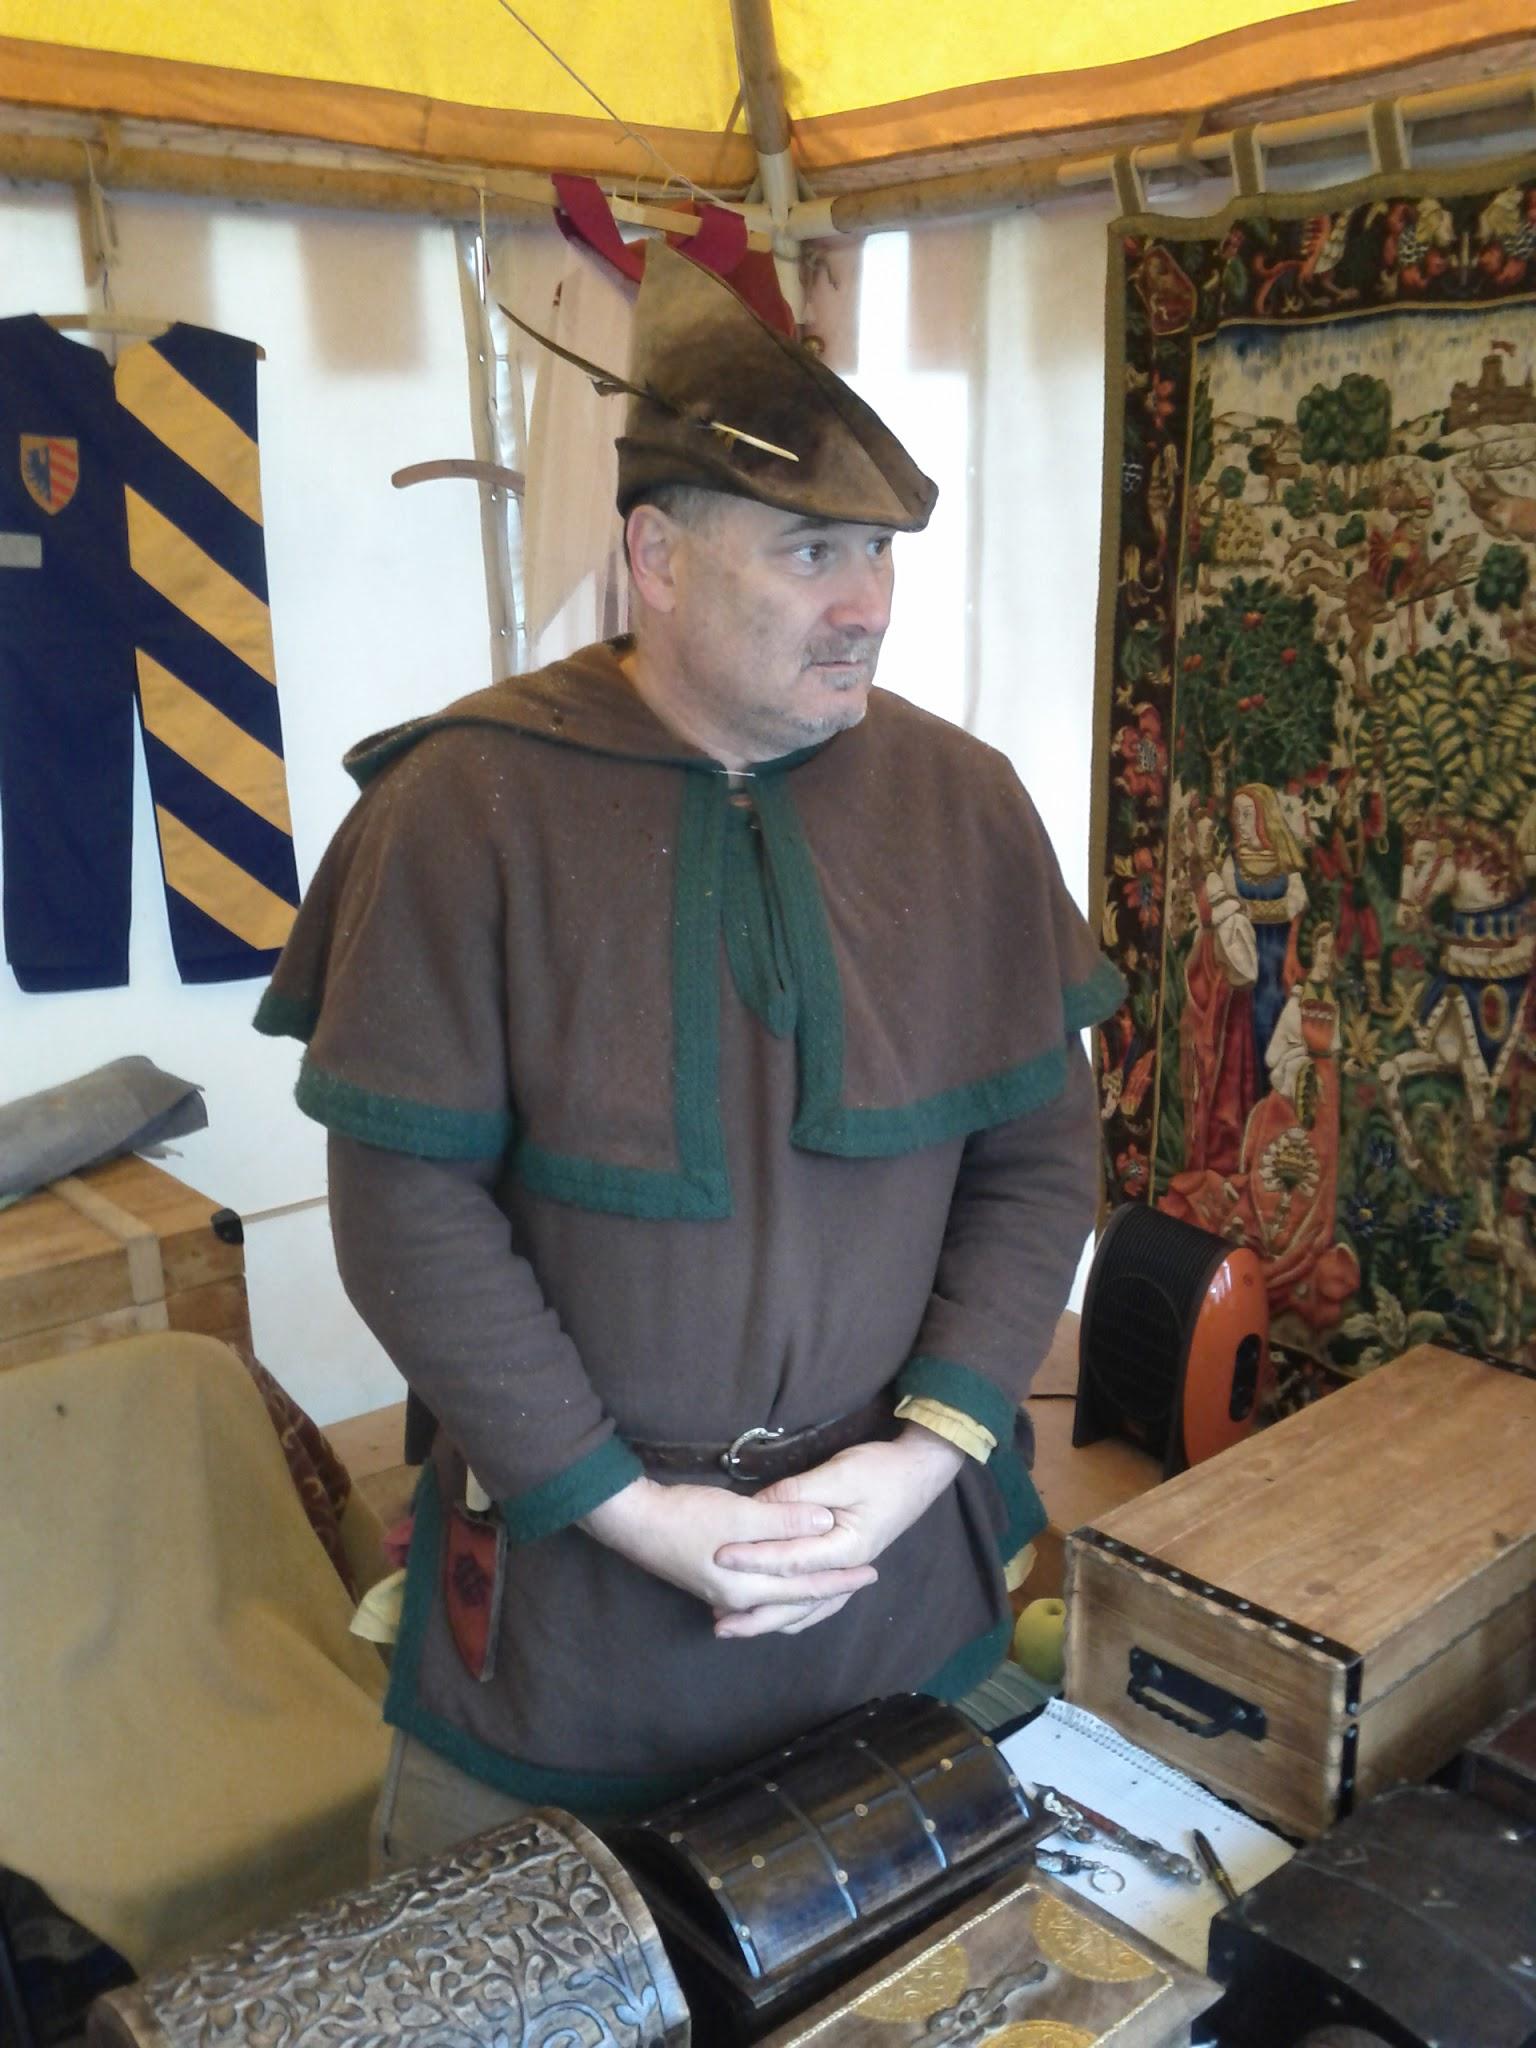 Mediaeval craftsman